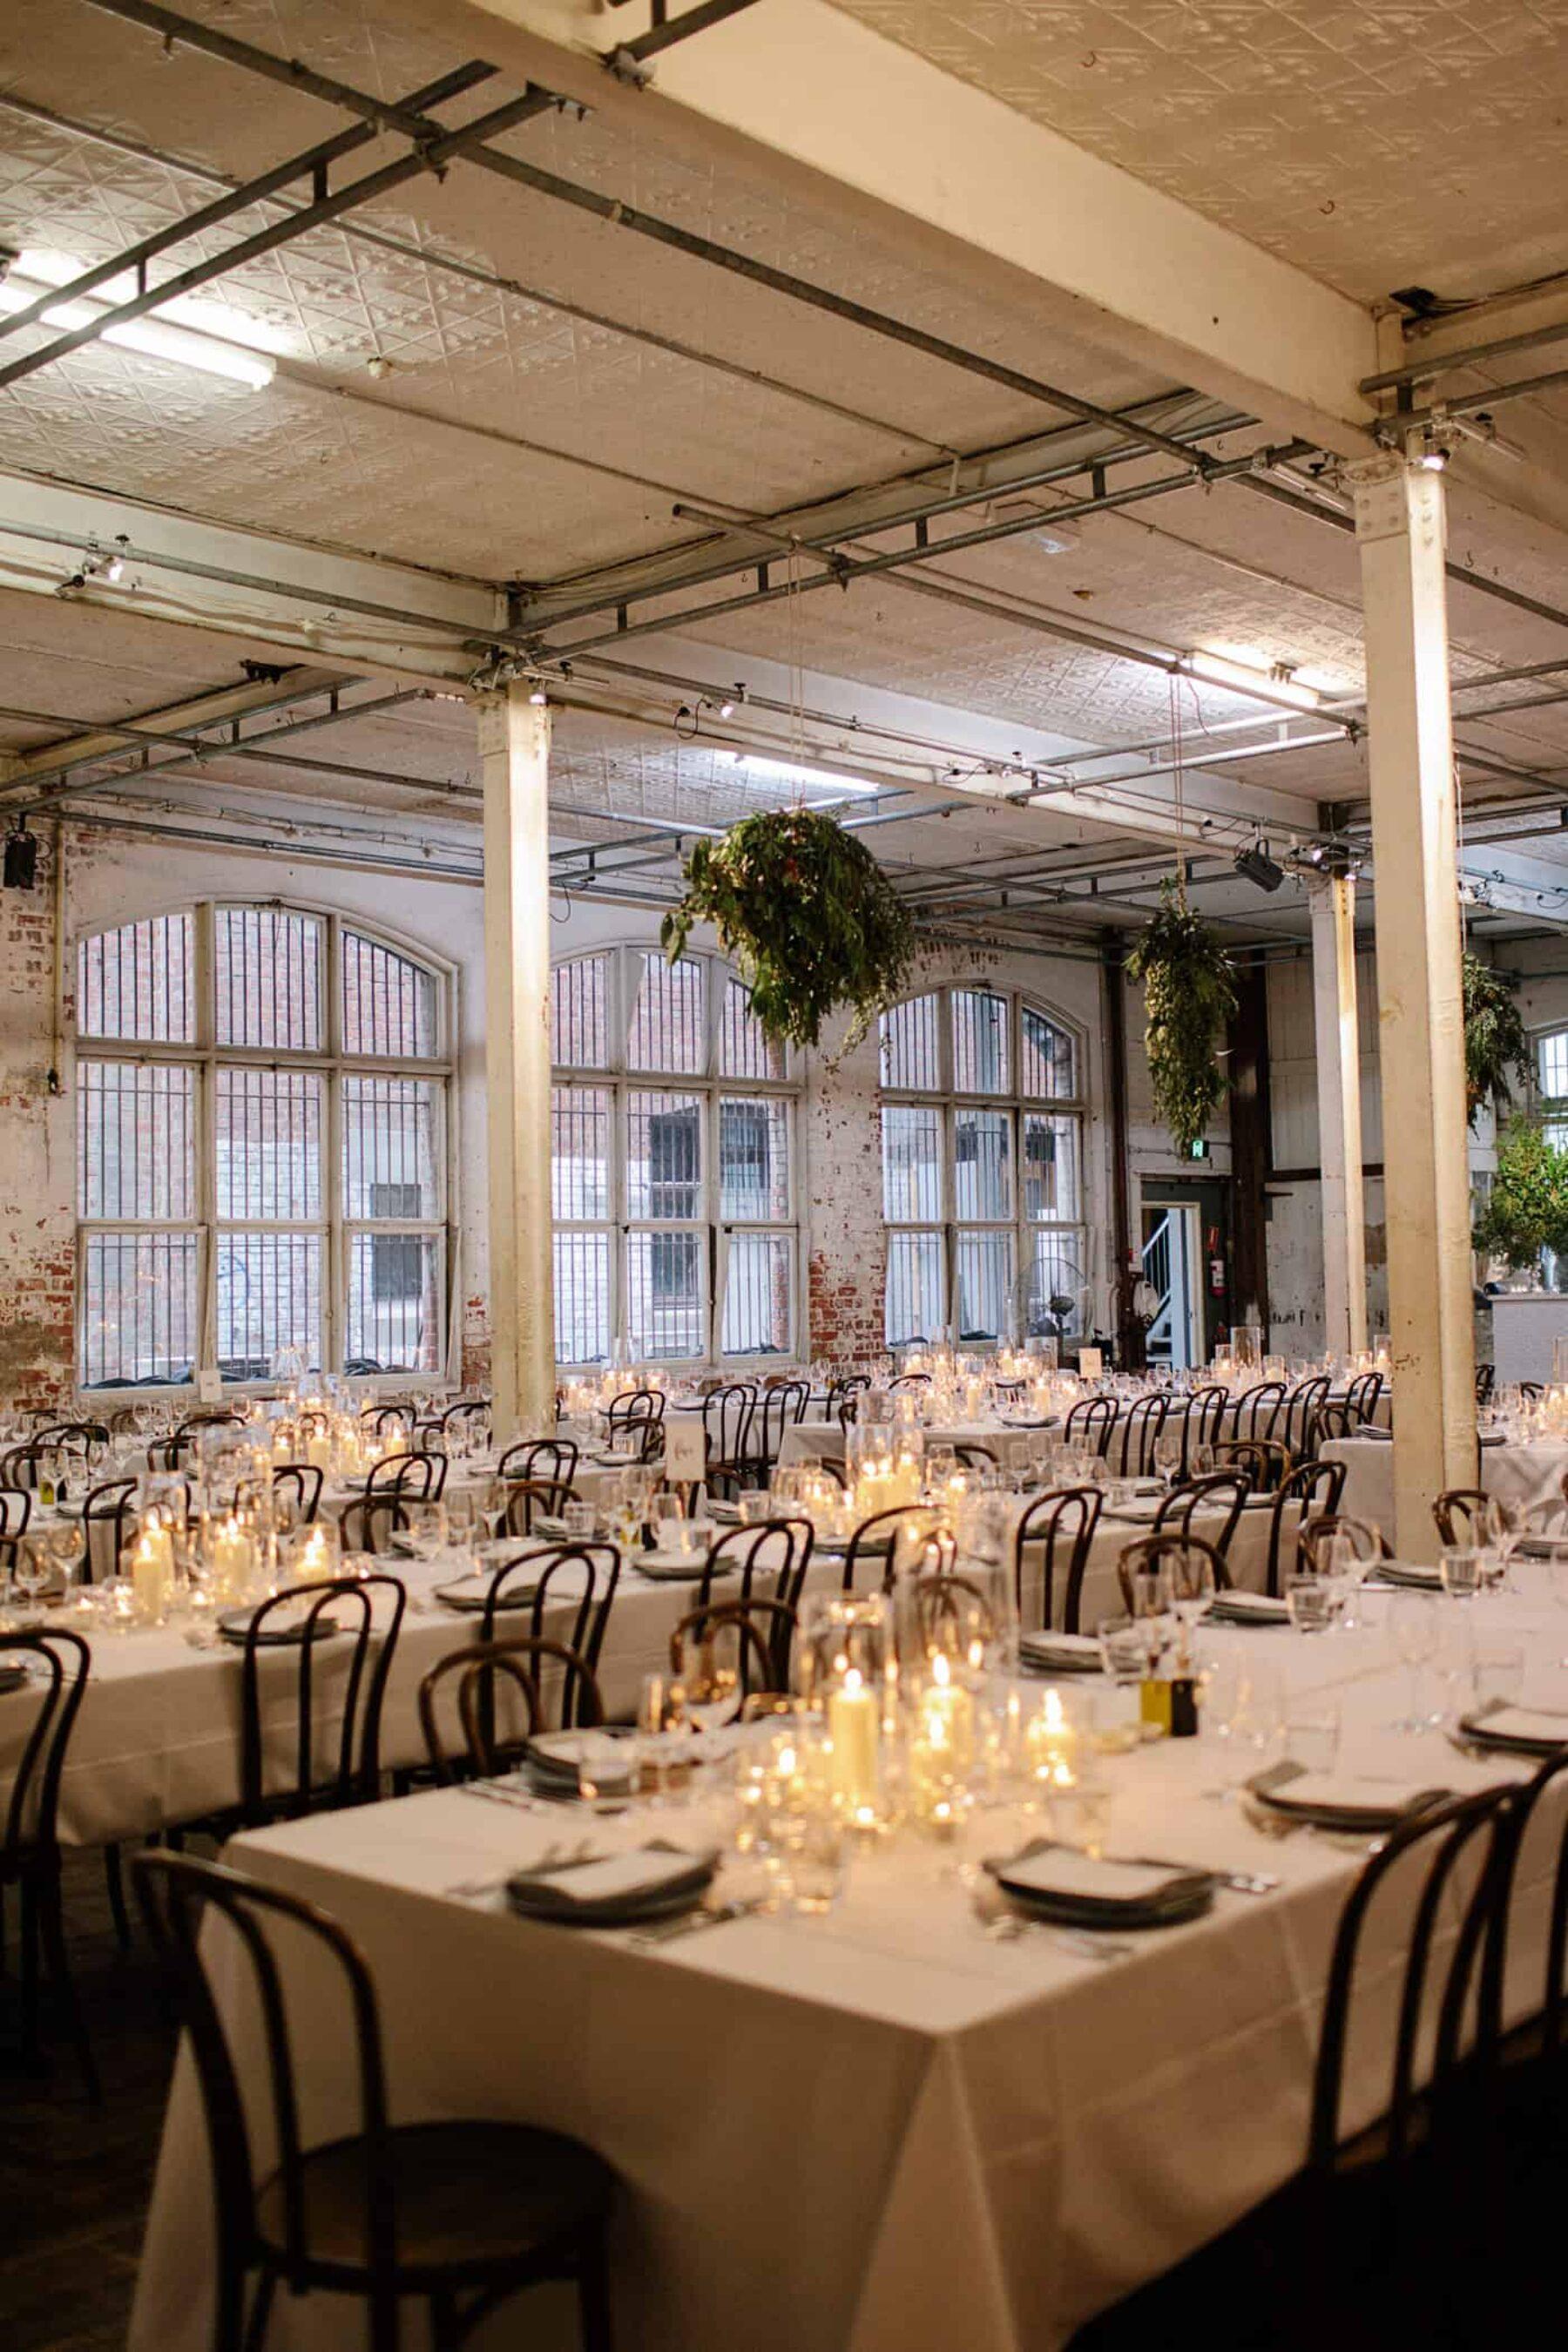 Luke Amp Phoebe S Warehouse Wedding At Fortyfive Downstairs